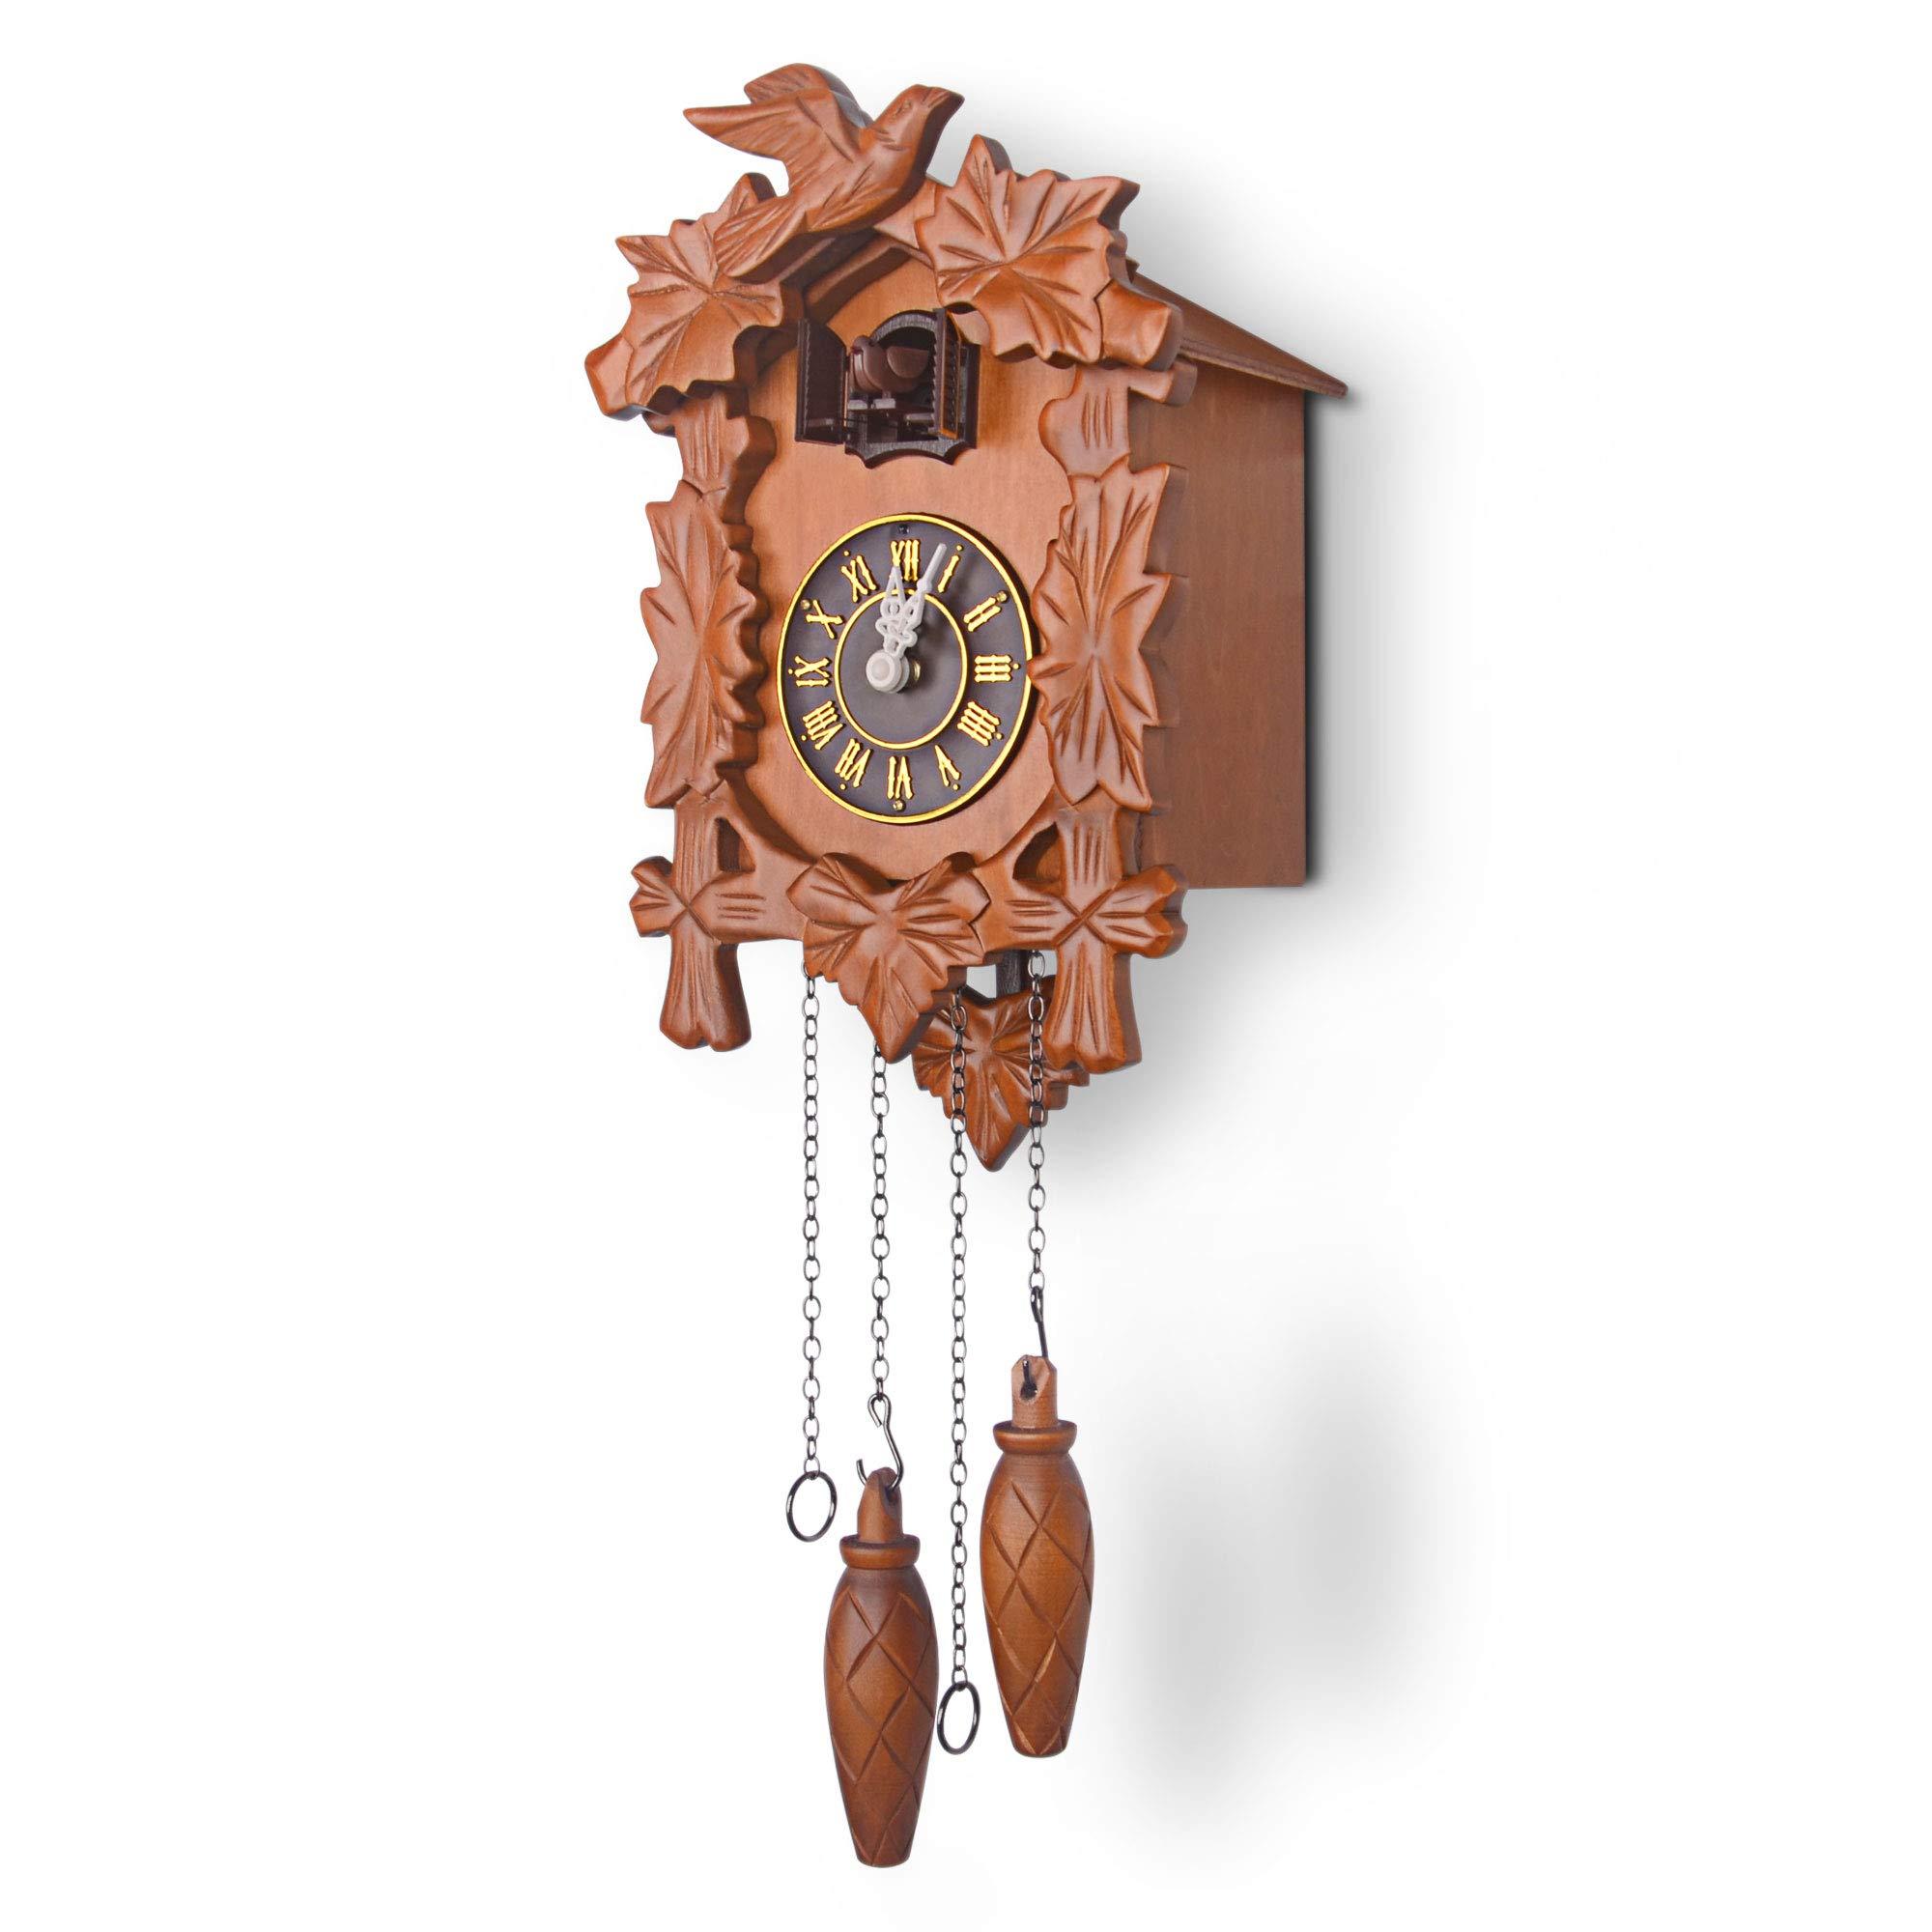 Kendal Handcrafted Wood Cuckoo Clock by Kendal